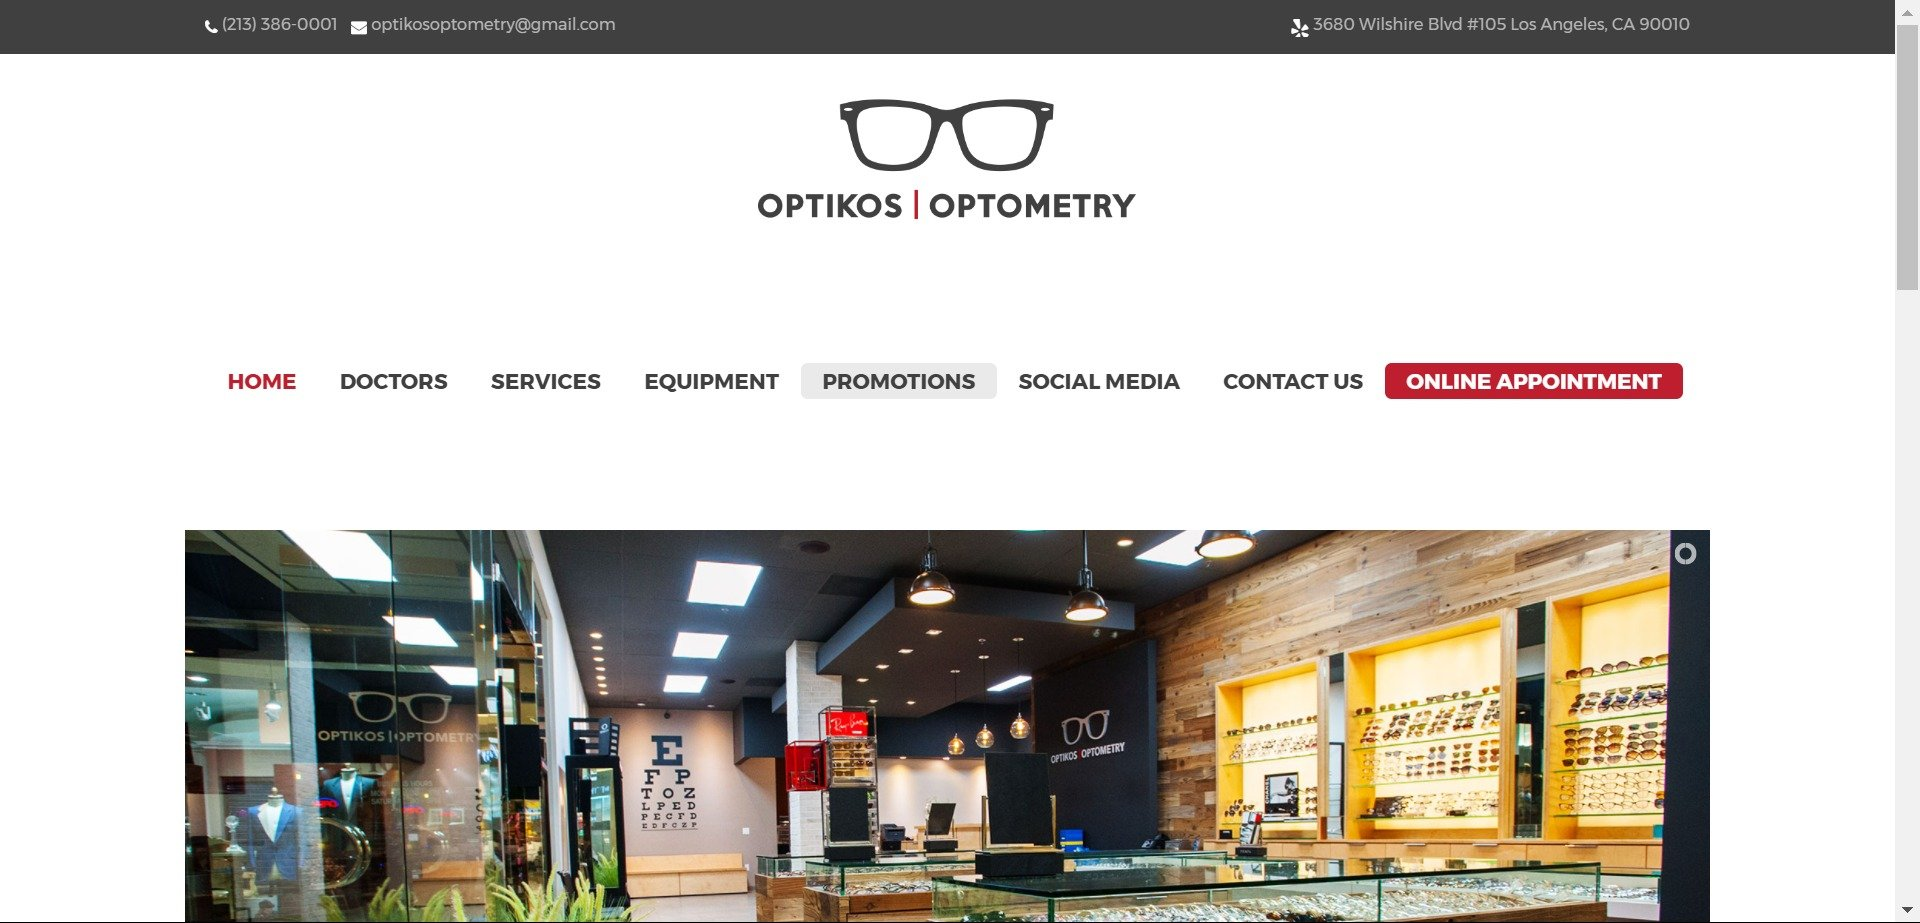 best-optometry-websites-optikosoptometry.com